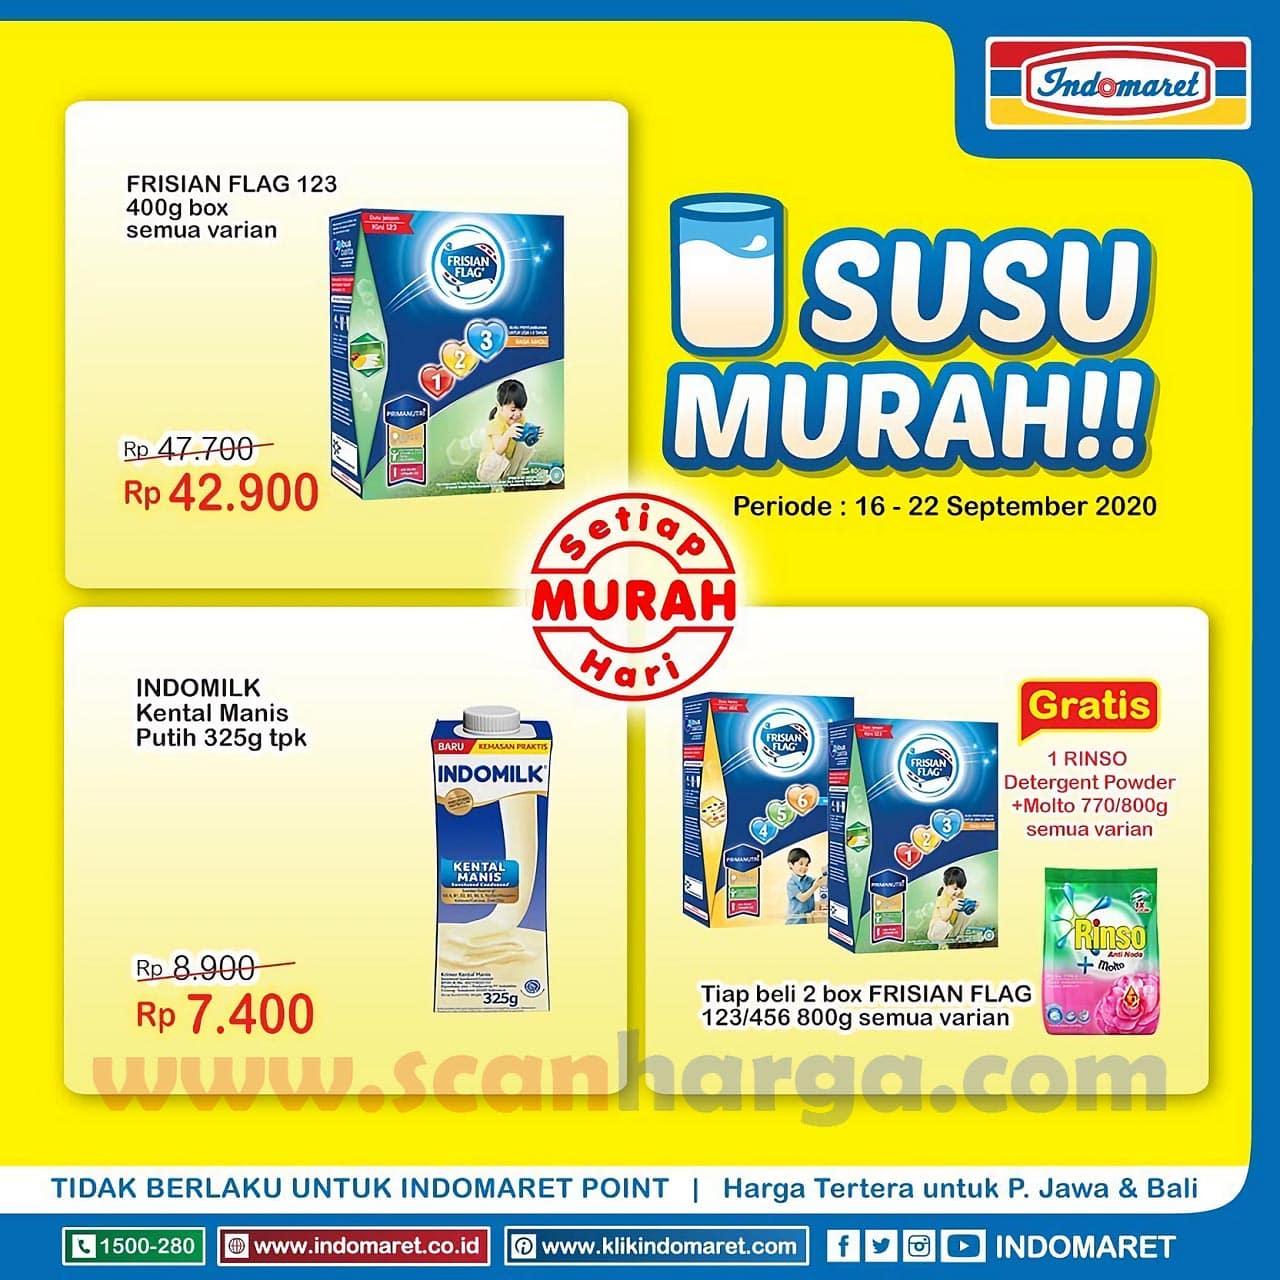 Katalog Promo Indomaret Heboh Susu Murah 16 - 22 September 2020